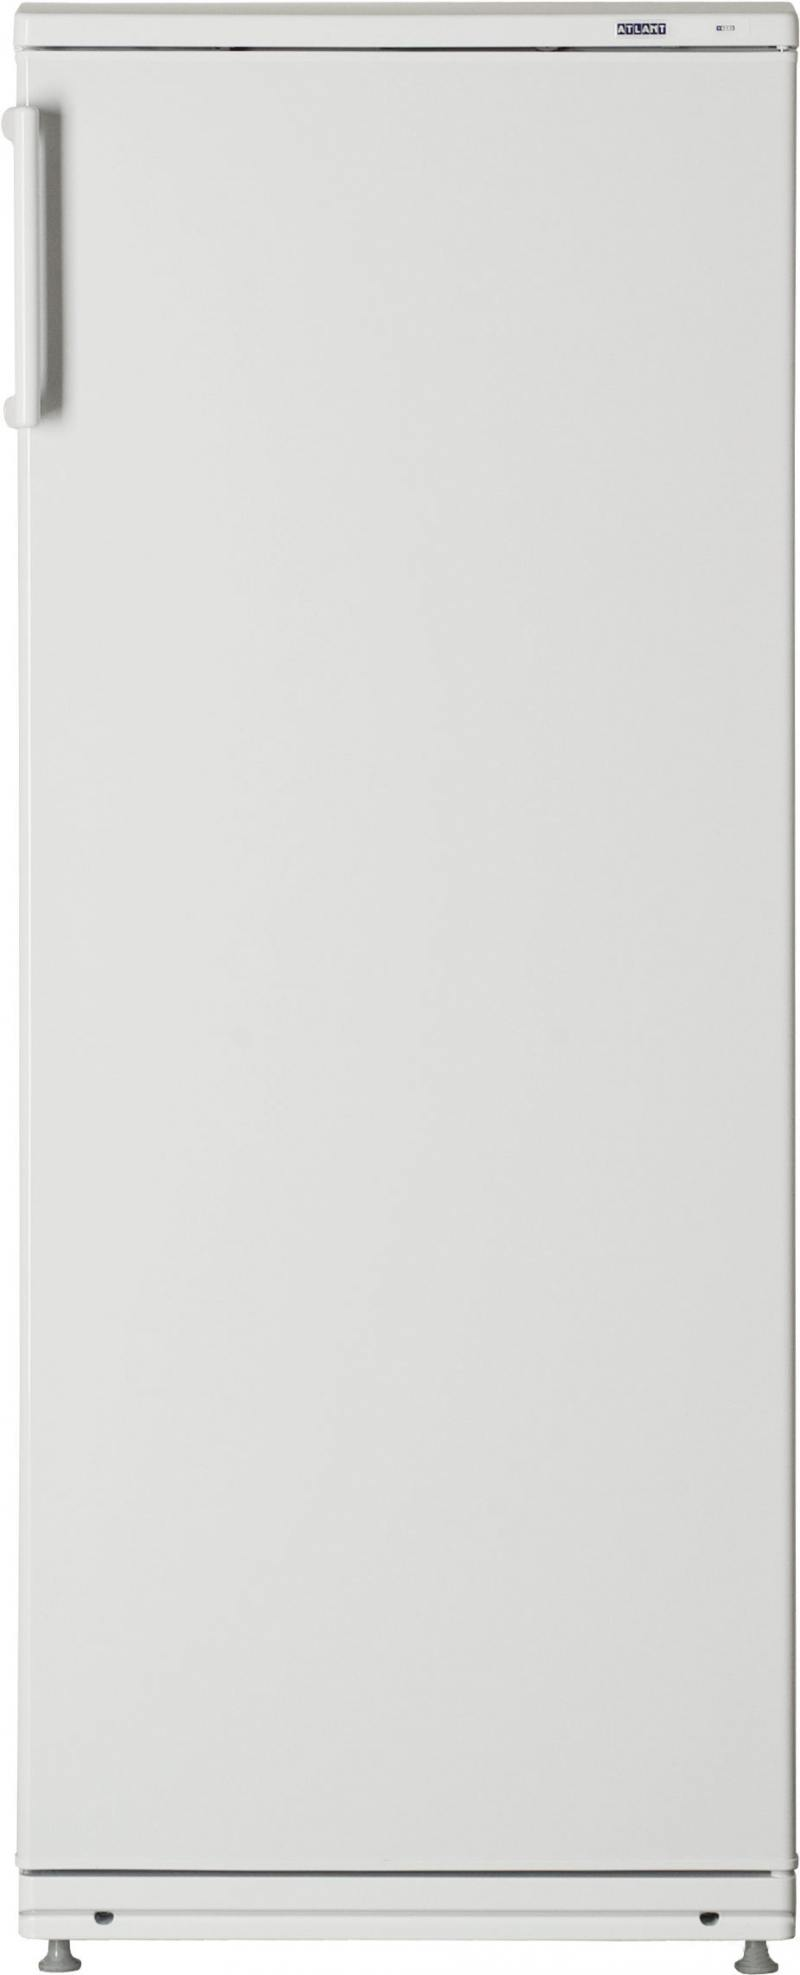 купить Холодильник ATLANT 2823-80 по цене 14690 рублей